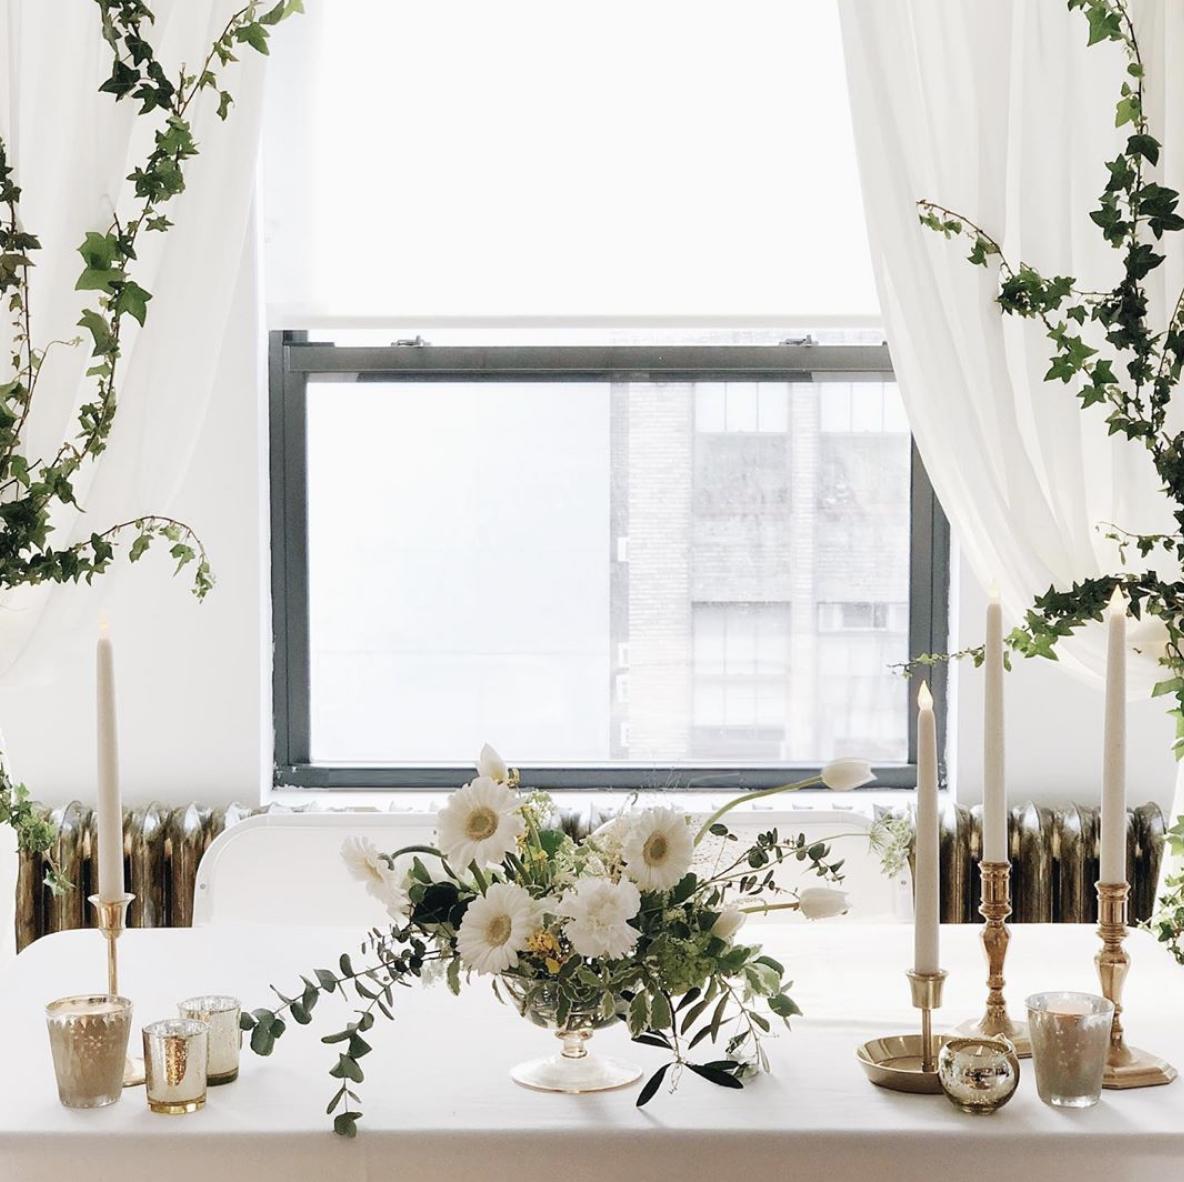 styl36degrees-wedding-signage.jpg